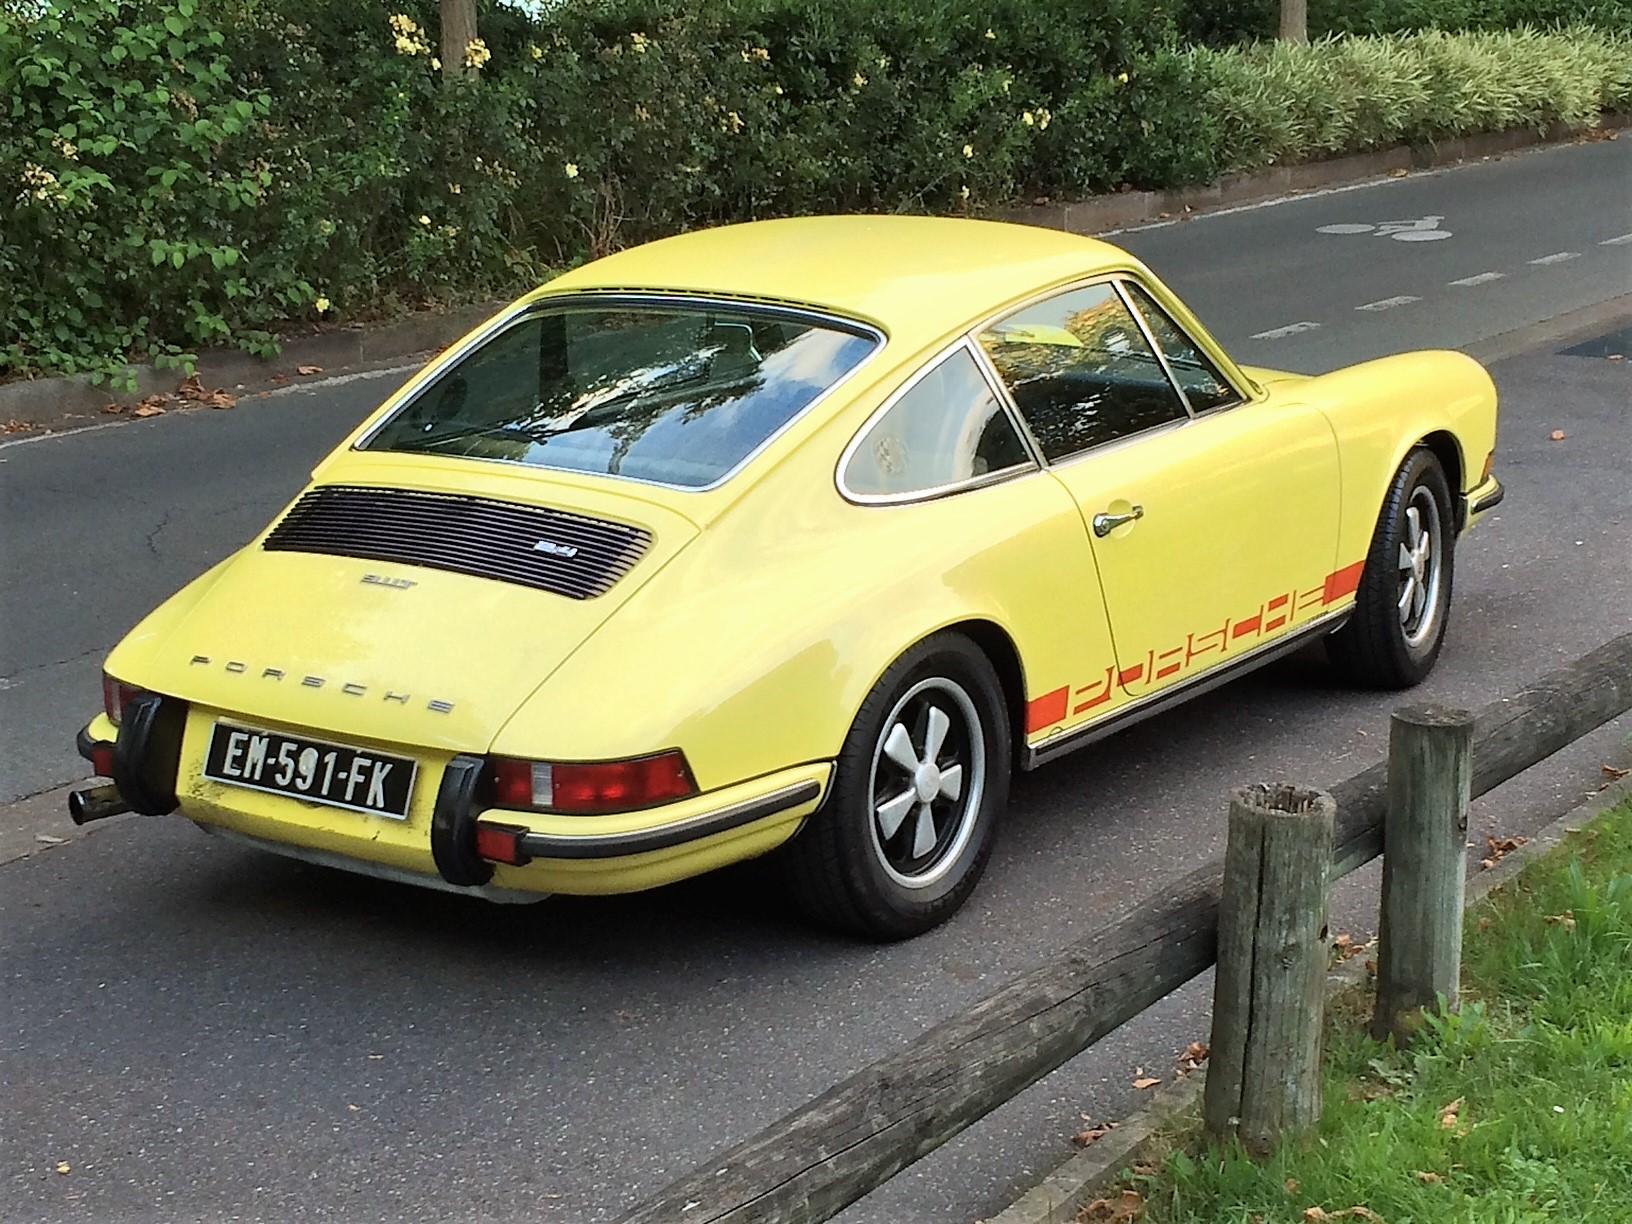 Porsche9112.4TE197305310_2017-11-12.JPG